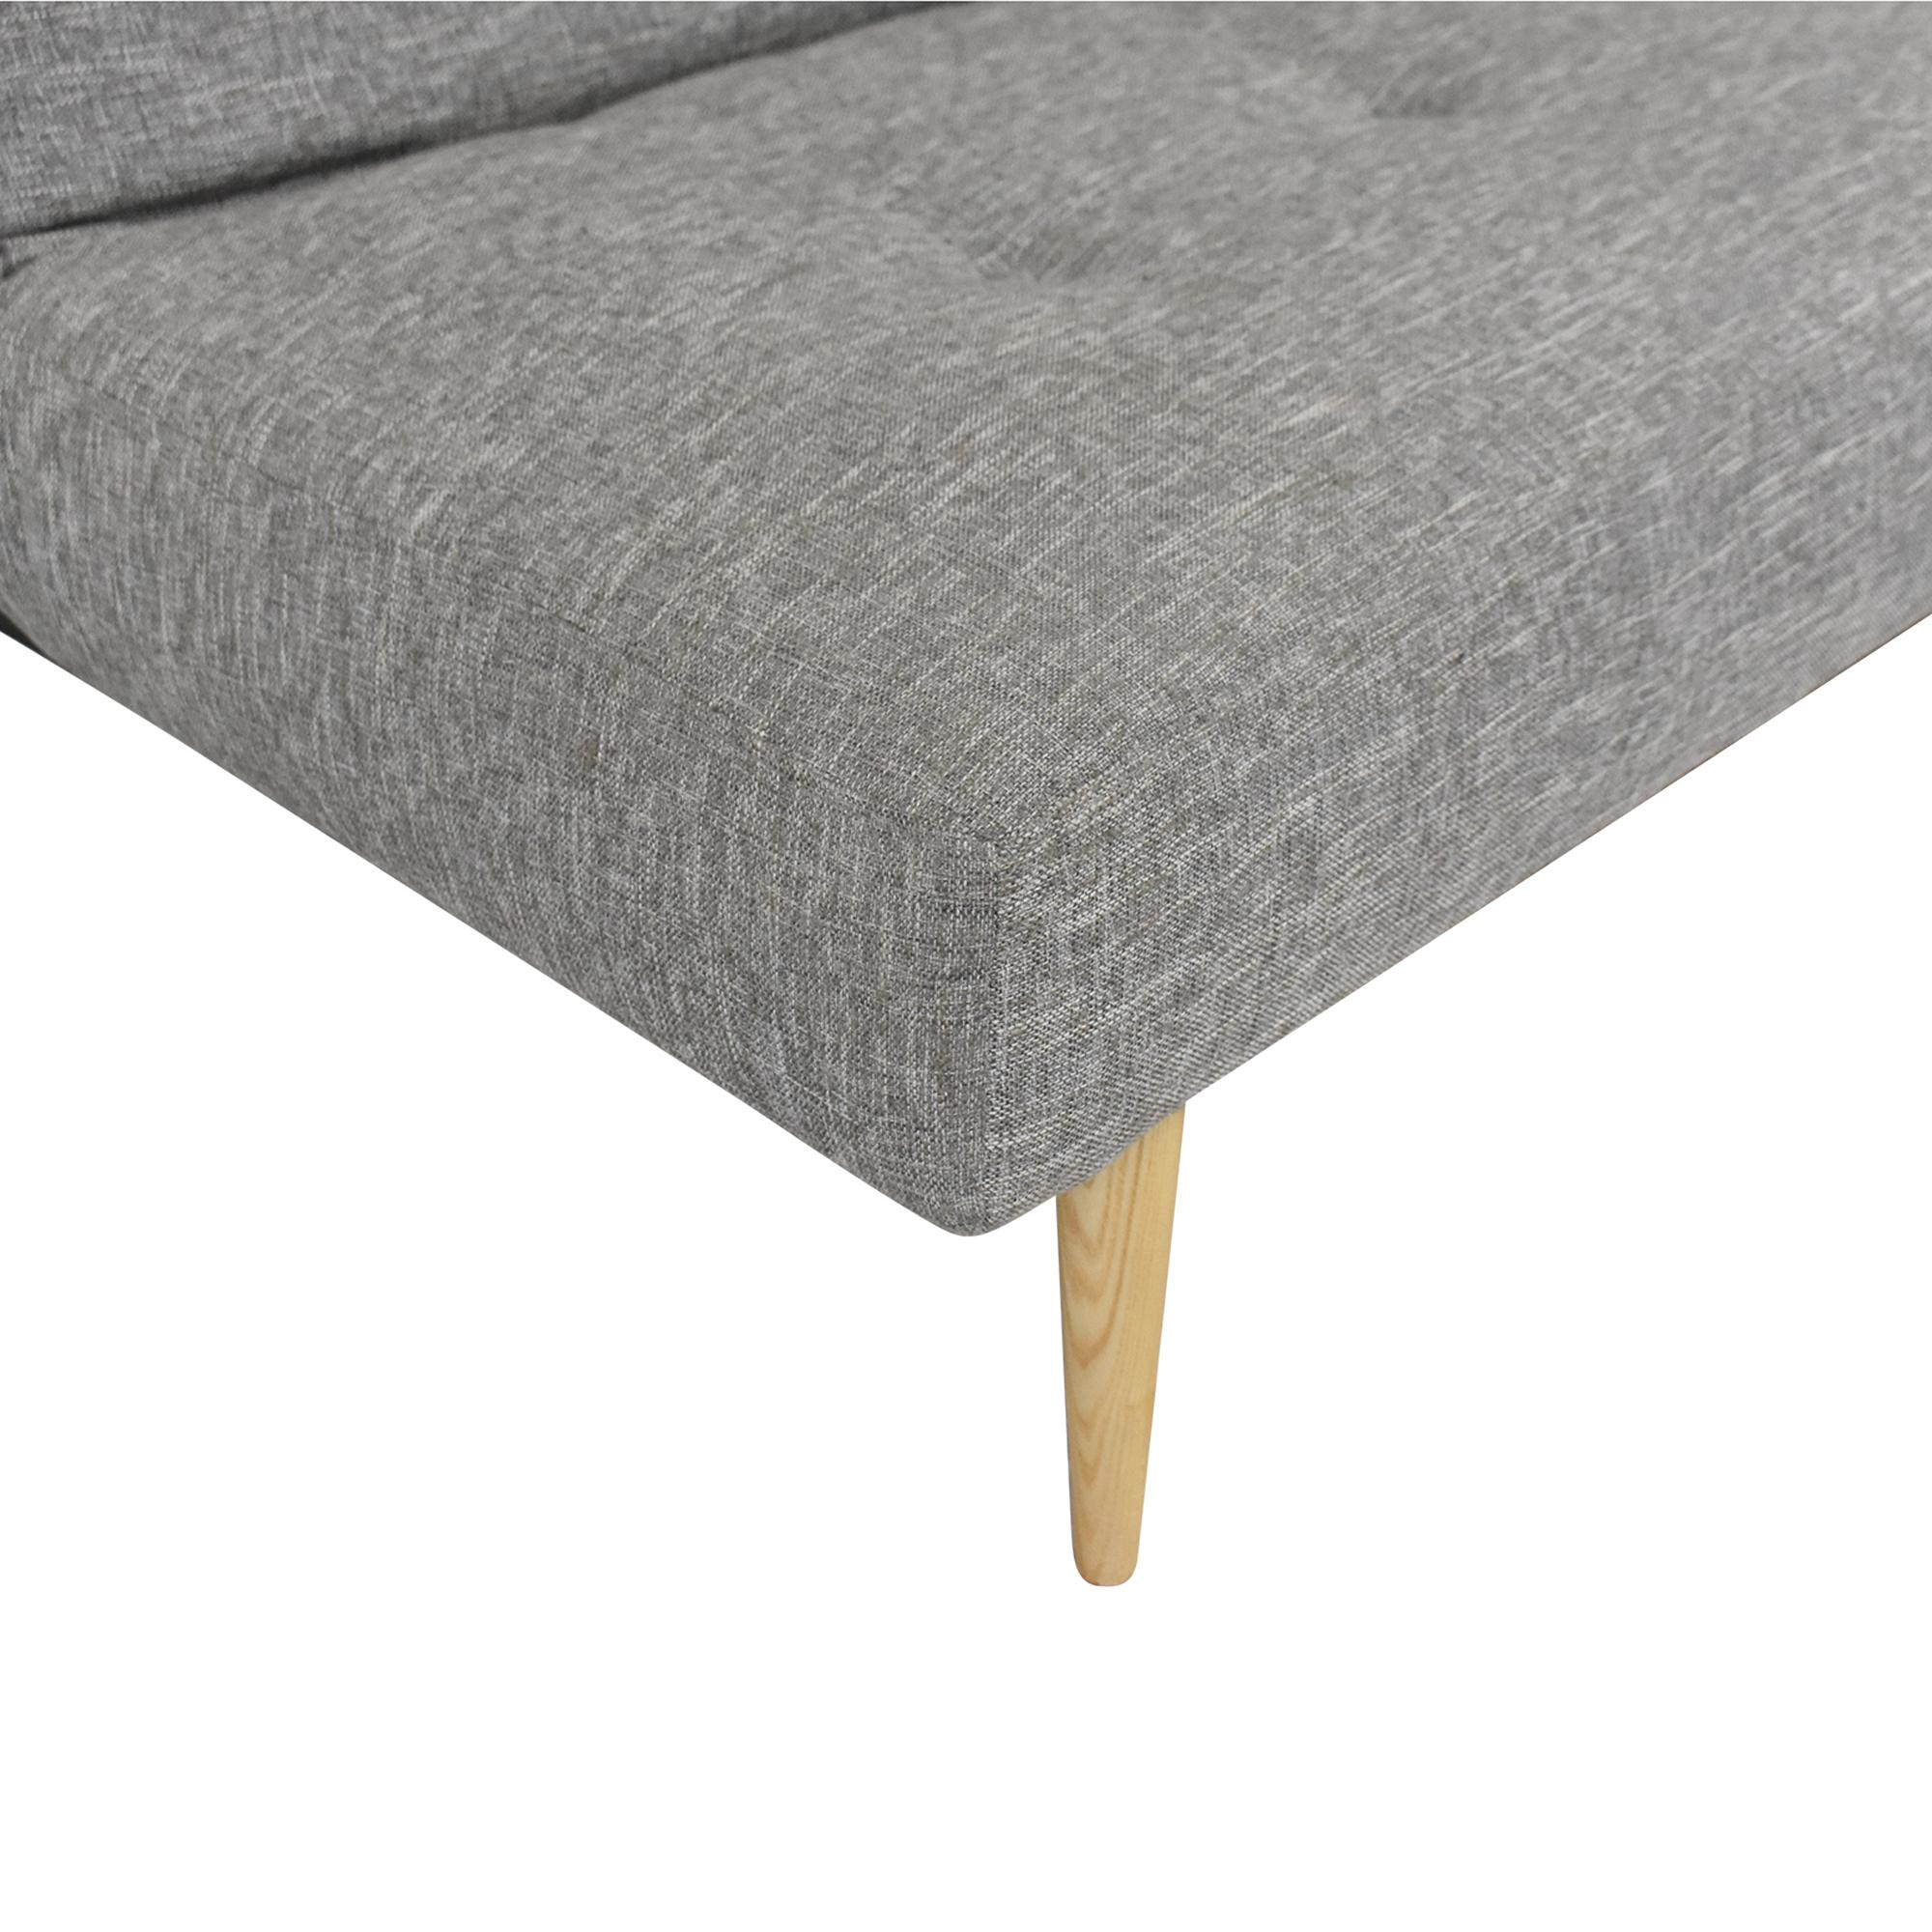 West Elm West Elm Mid-Century Futon Sofa grey